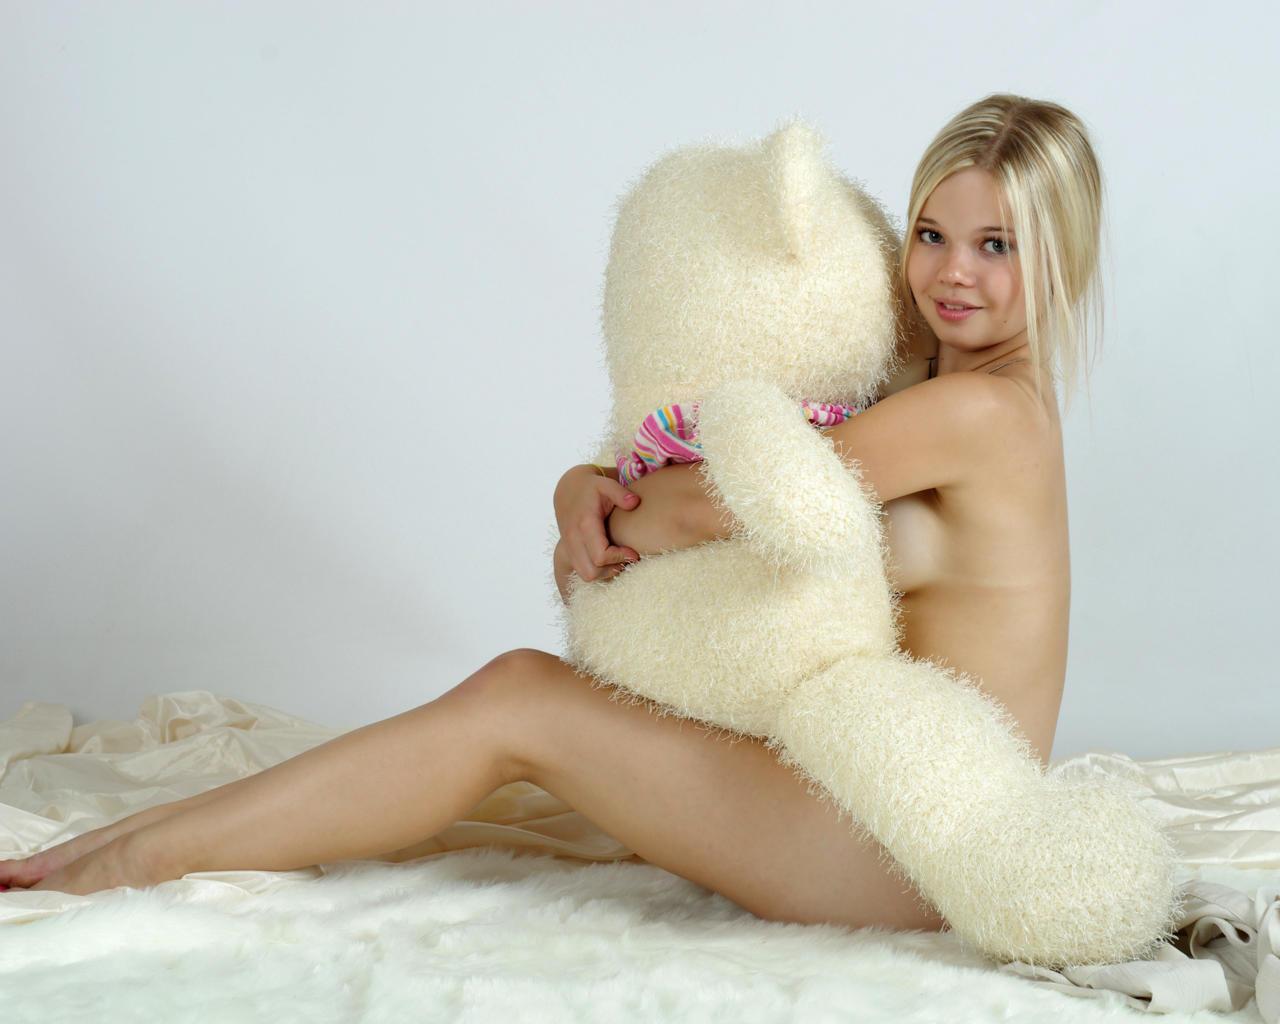 Mongolian hairy nude pics